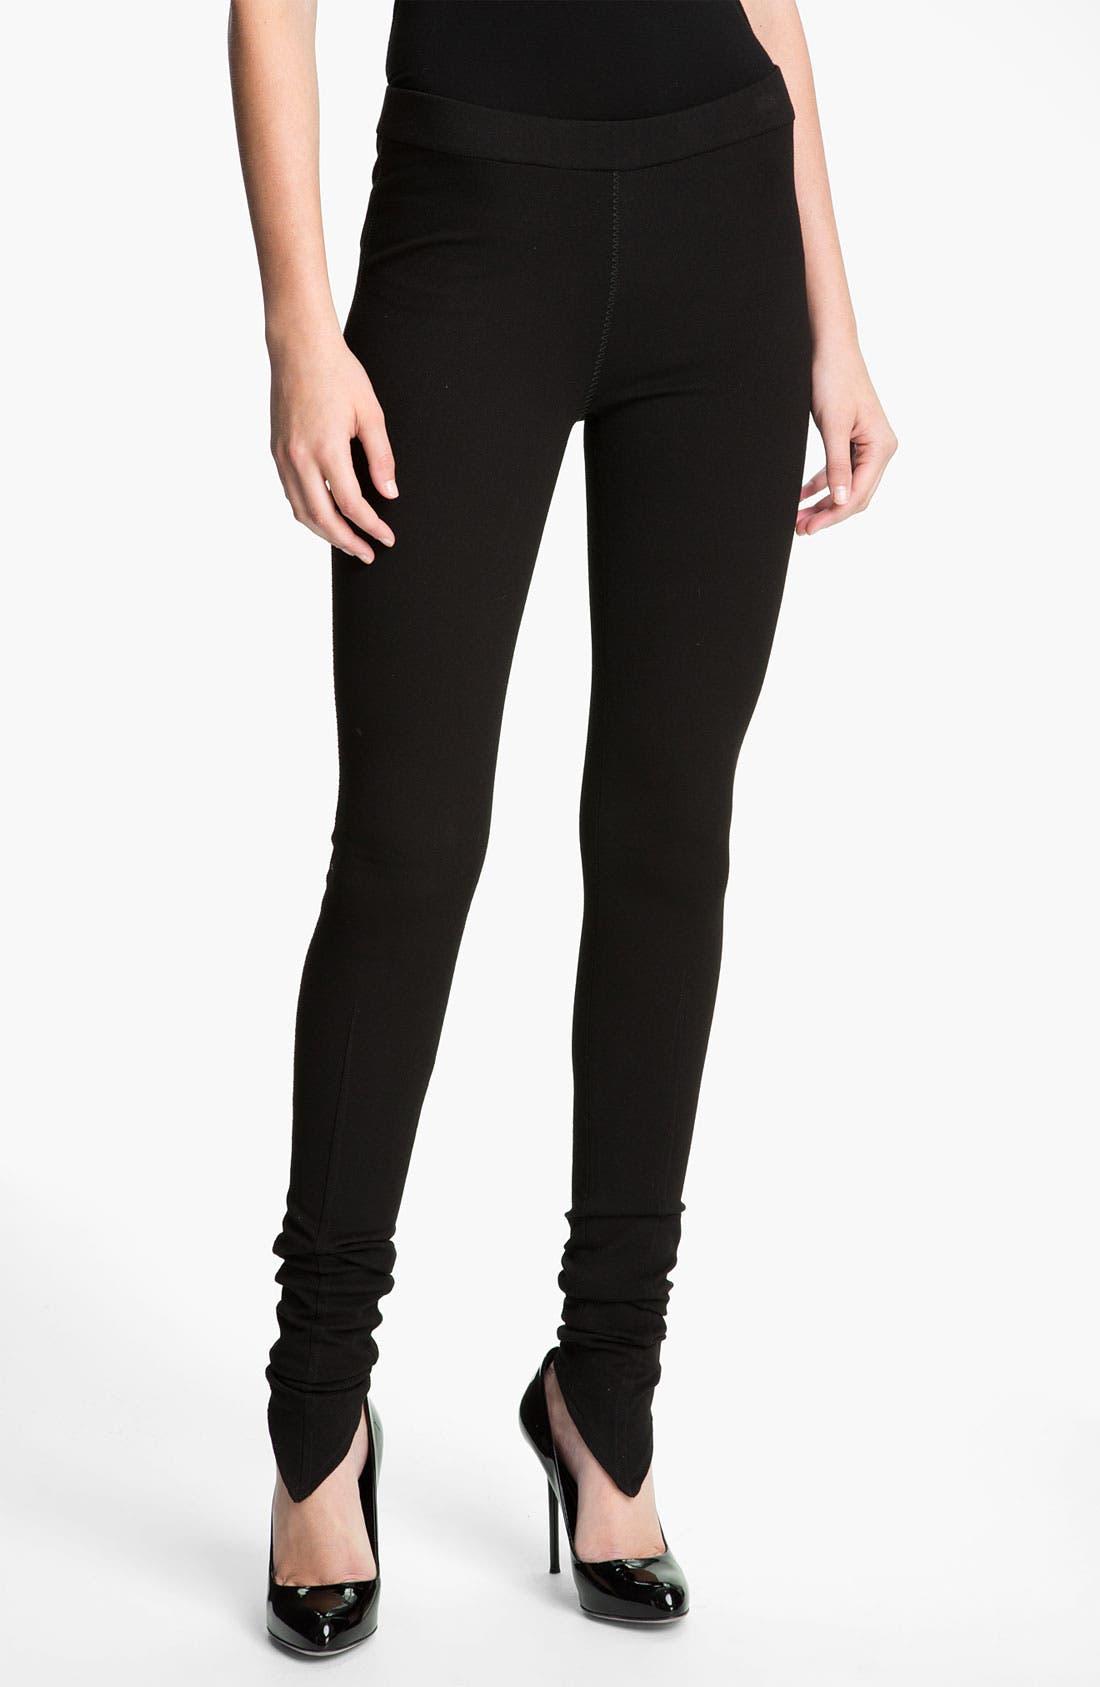 Alternate Image 1 Selected - Kelly Wearstler Micro Stretch Knit Pants